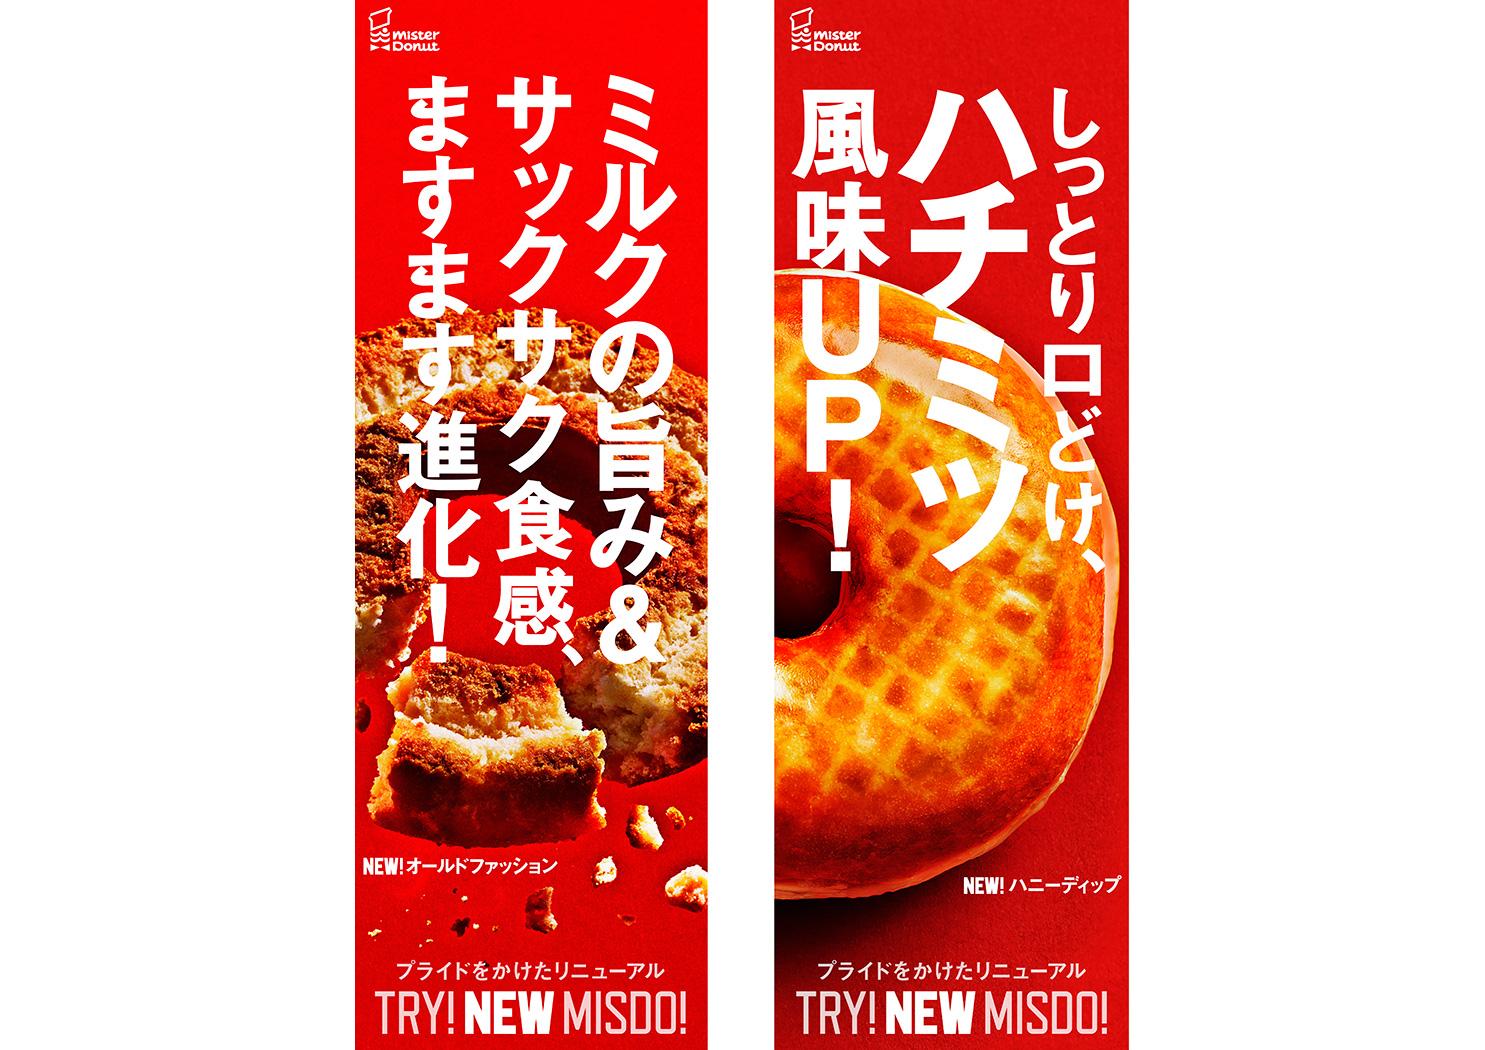 Mister Donut 2013 Nobori